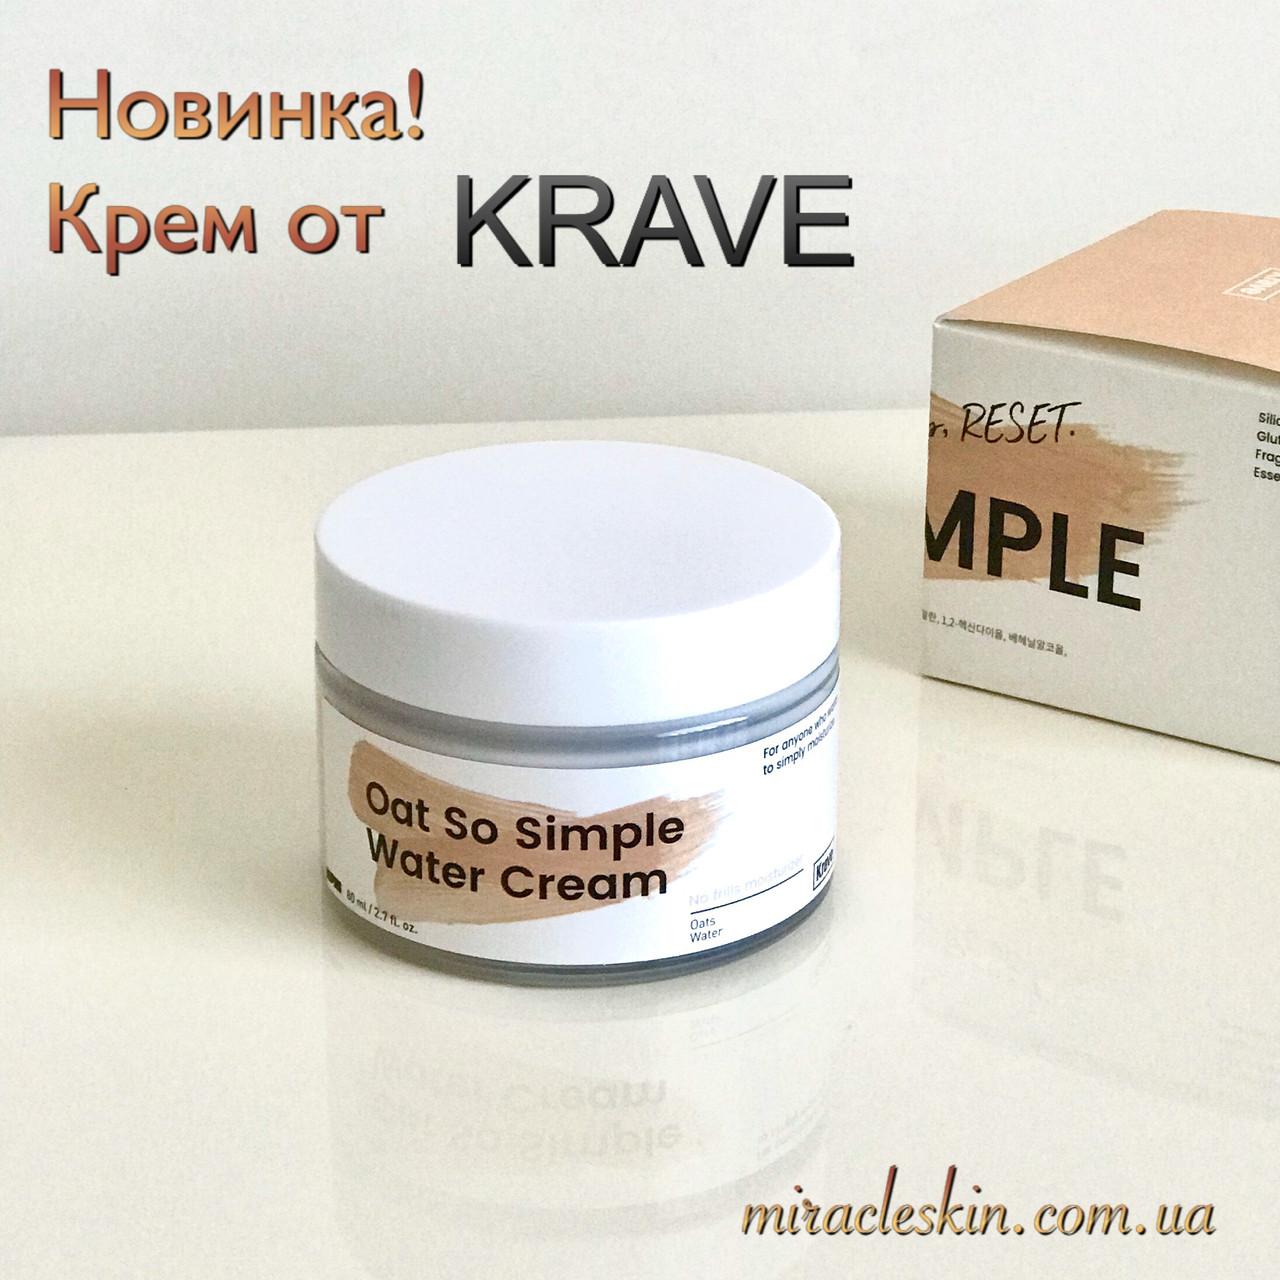 Увлажняющий крем Krave Beauty Oat So Simple Water Cream, 80ml